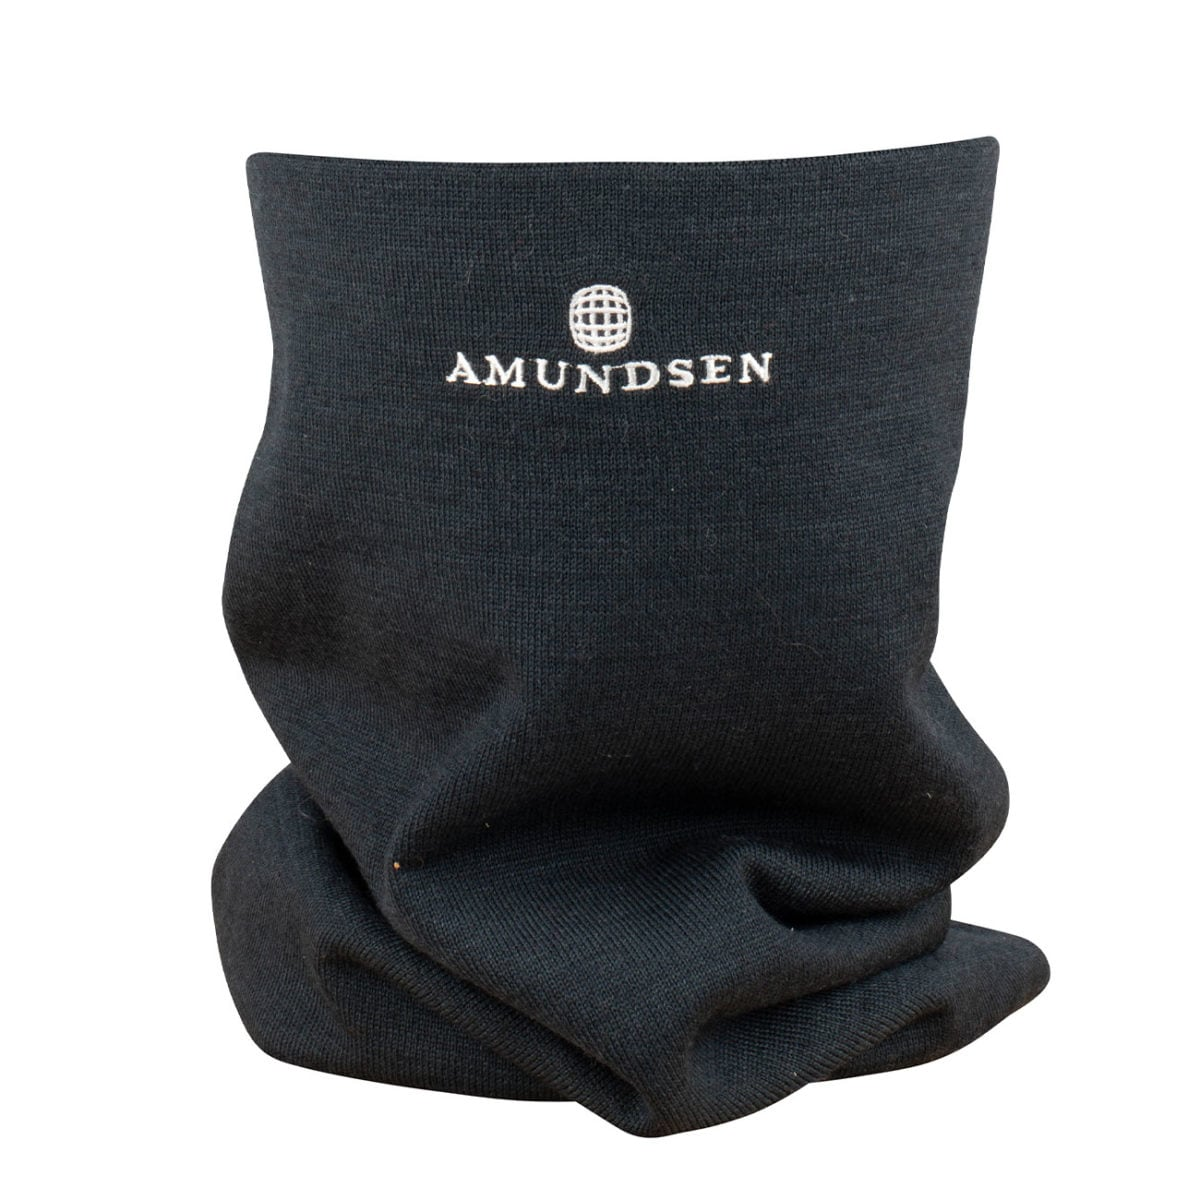 Amundsen Sports 5MILA Neckwarmer